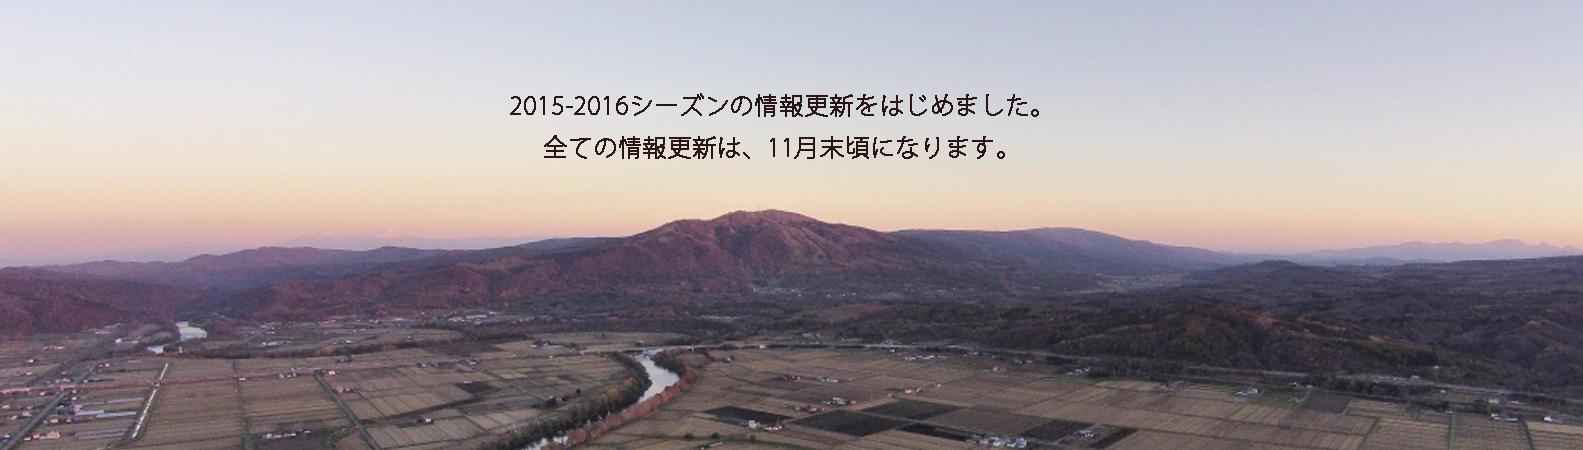 Autumn2015web_cover001